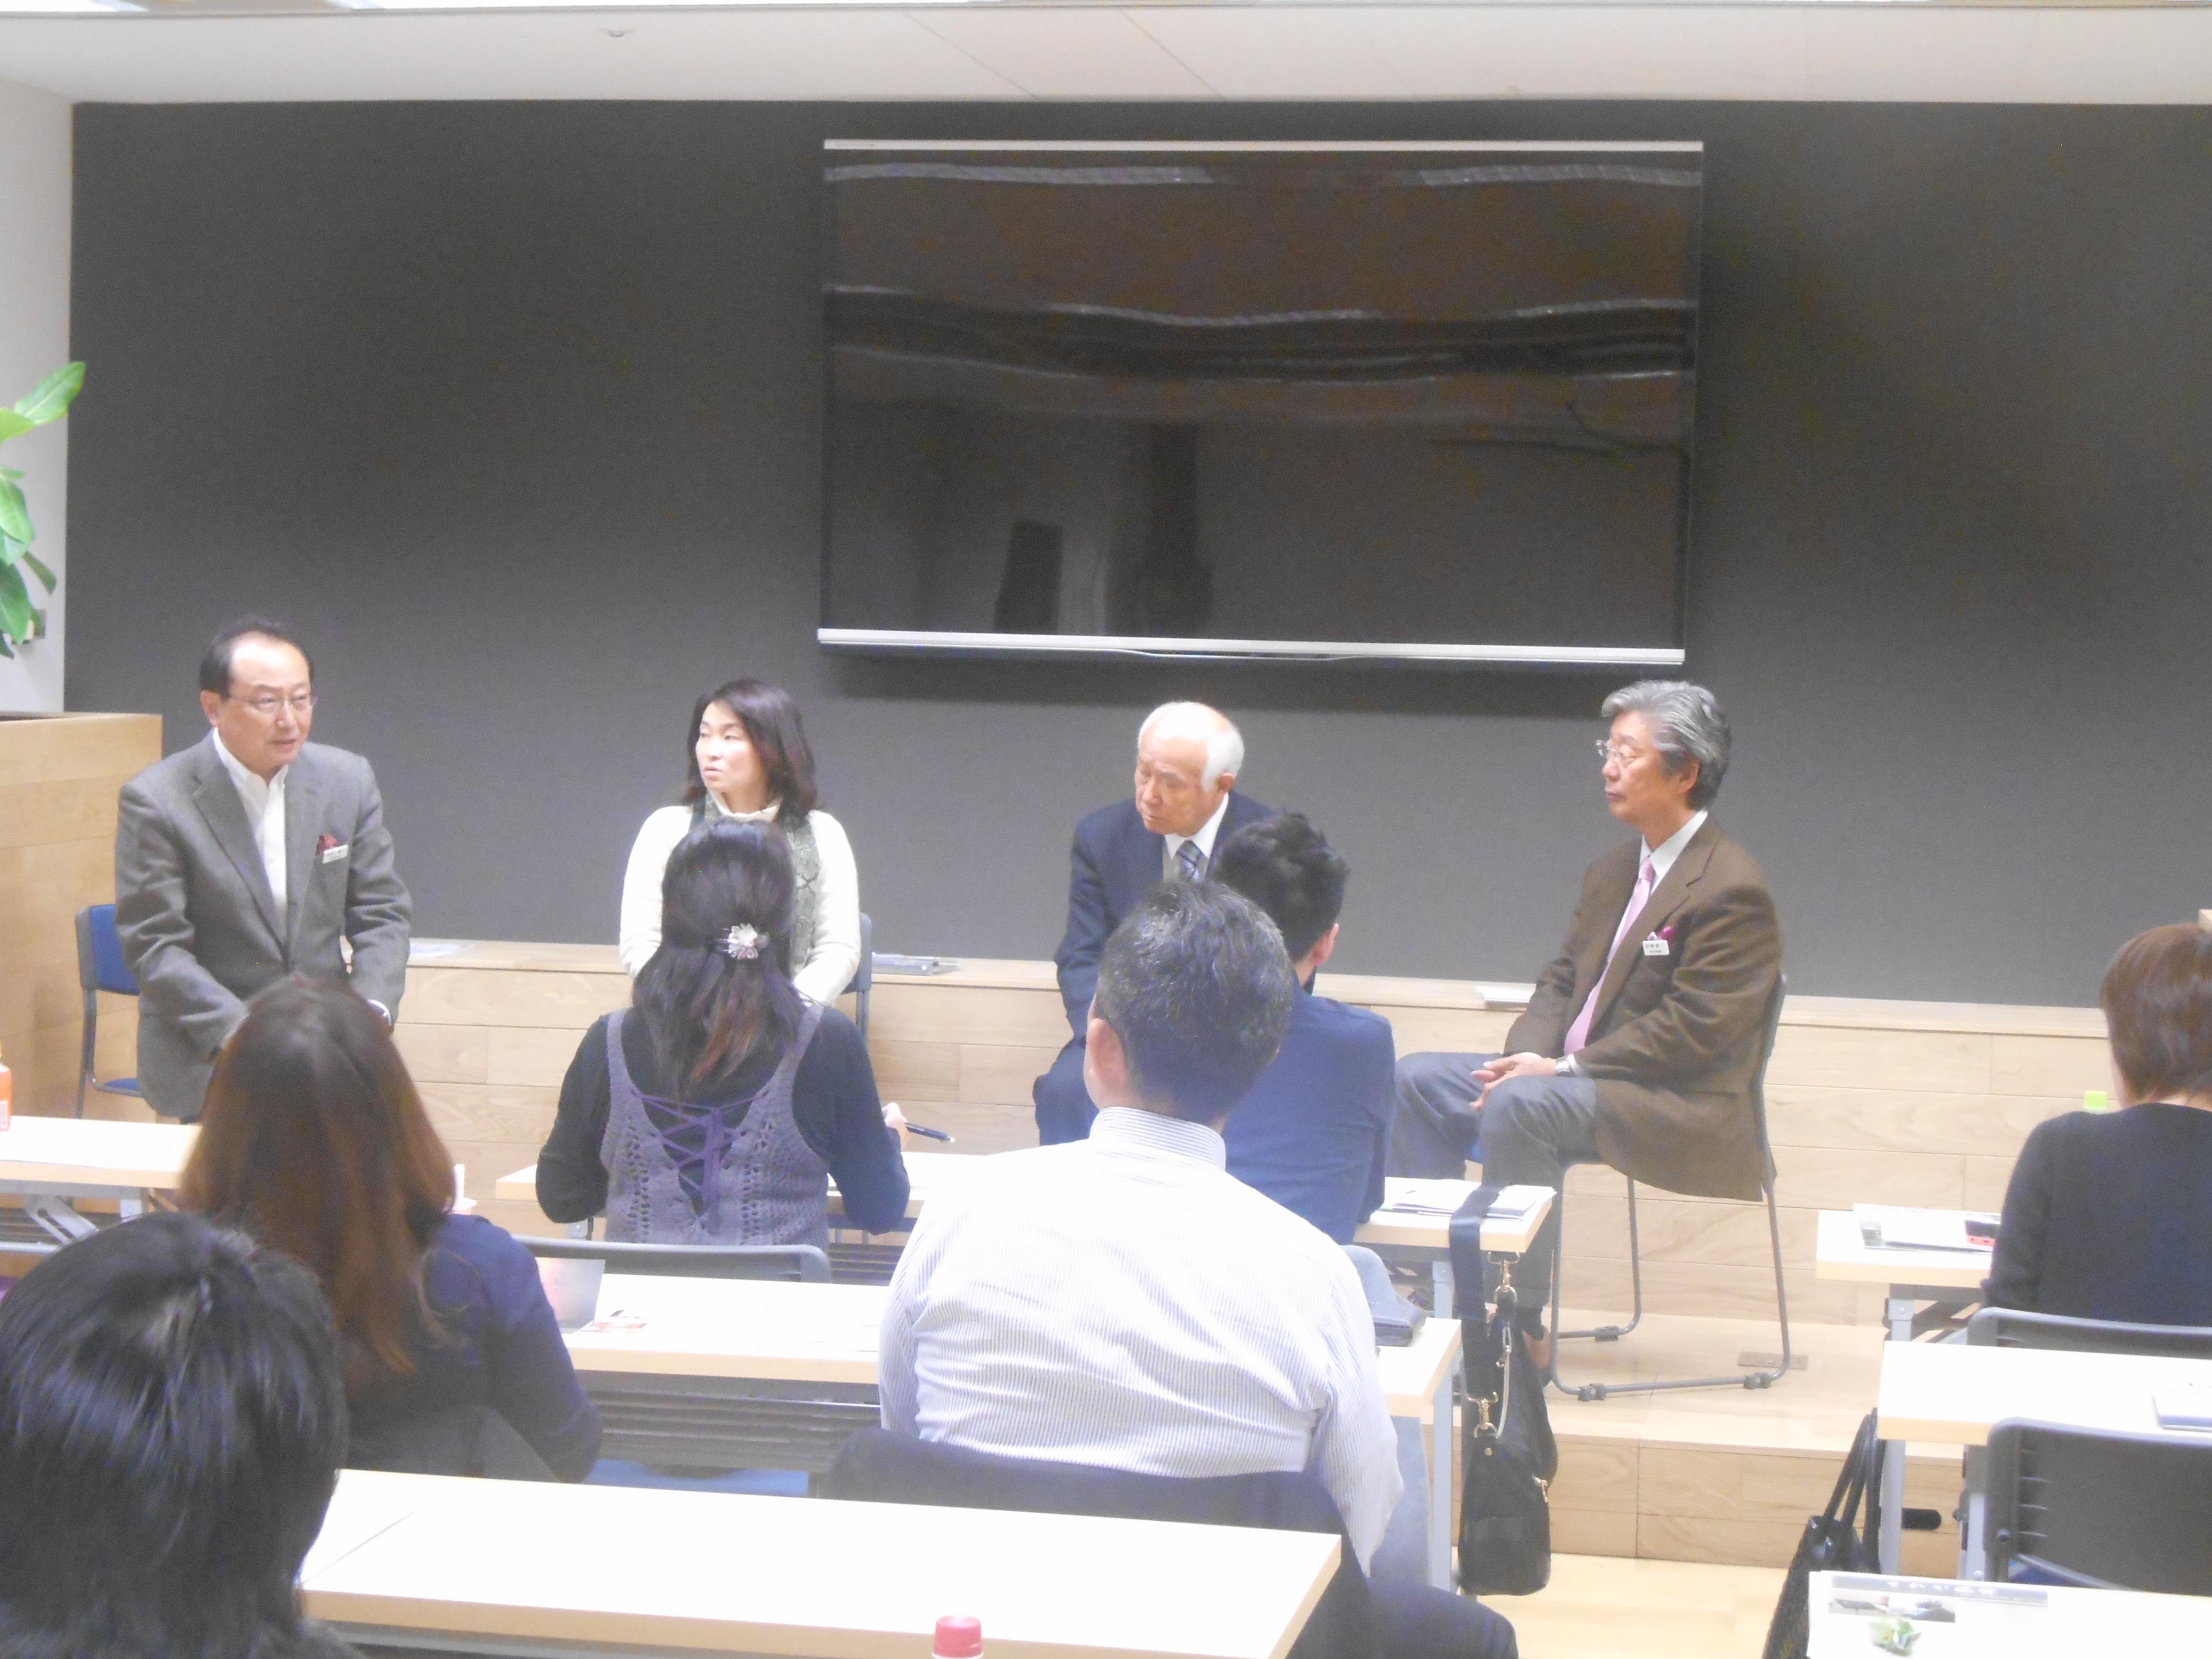 DSCN0459 - 2017年2月4日東京思風塾開催